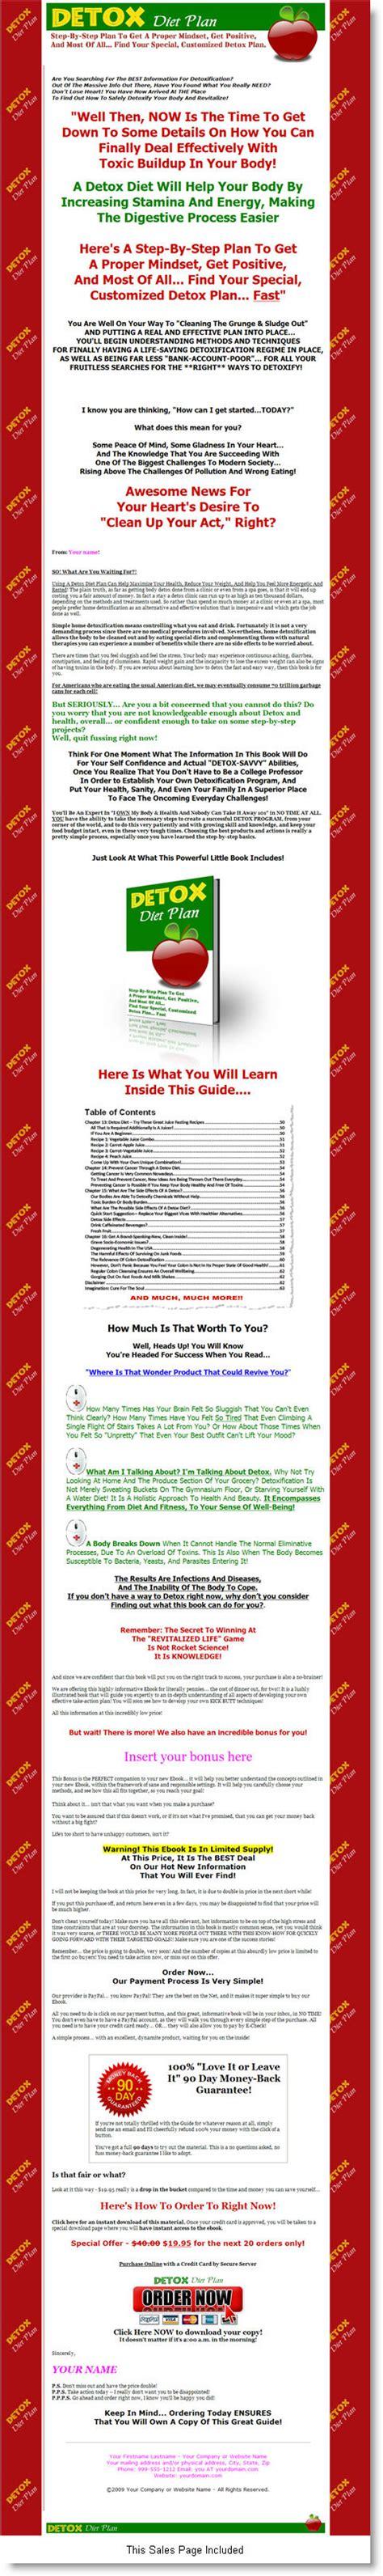 Detox Diet Meal Plan Pdf by Detox Diet Plan Ebook Label Rights